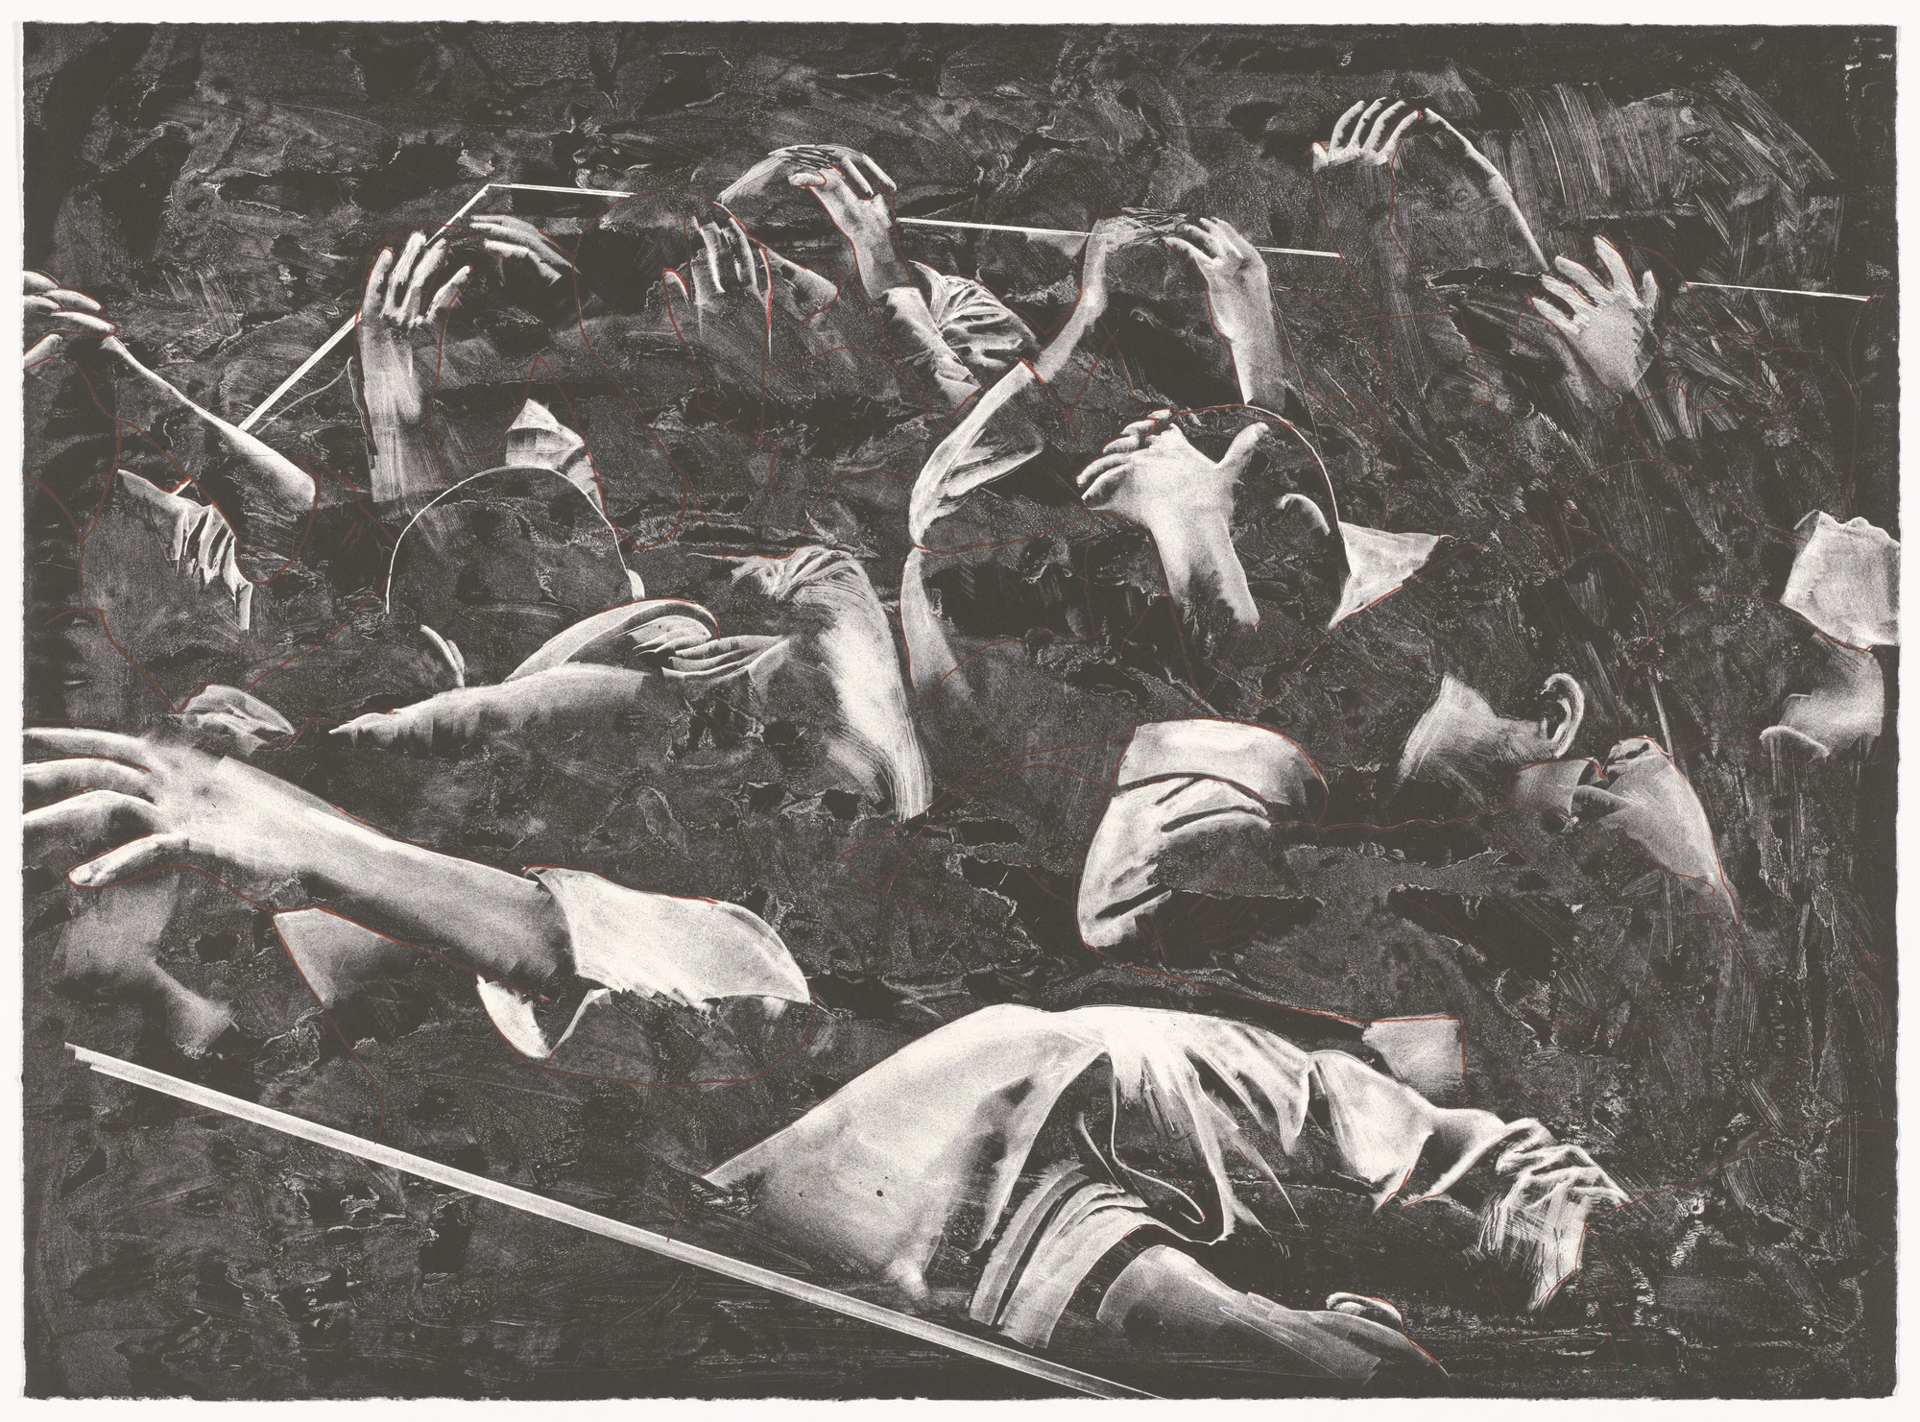 The Prisoners by Rafael Canogar